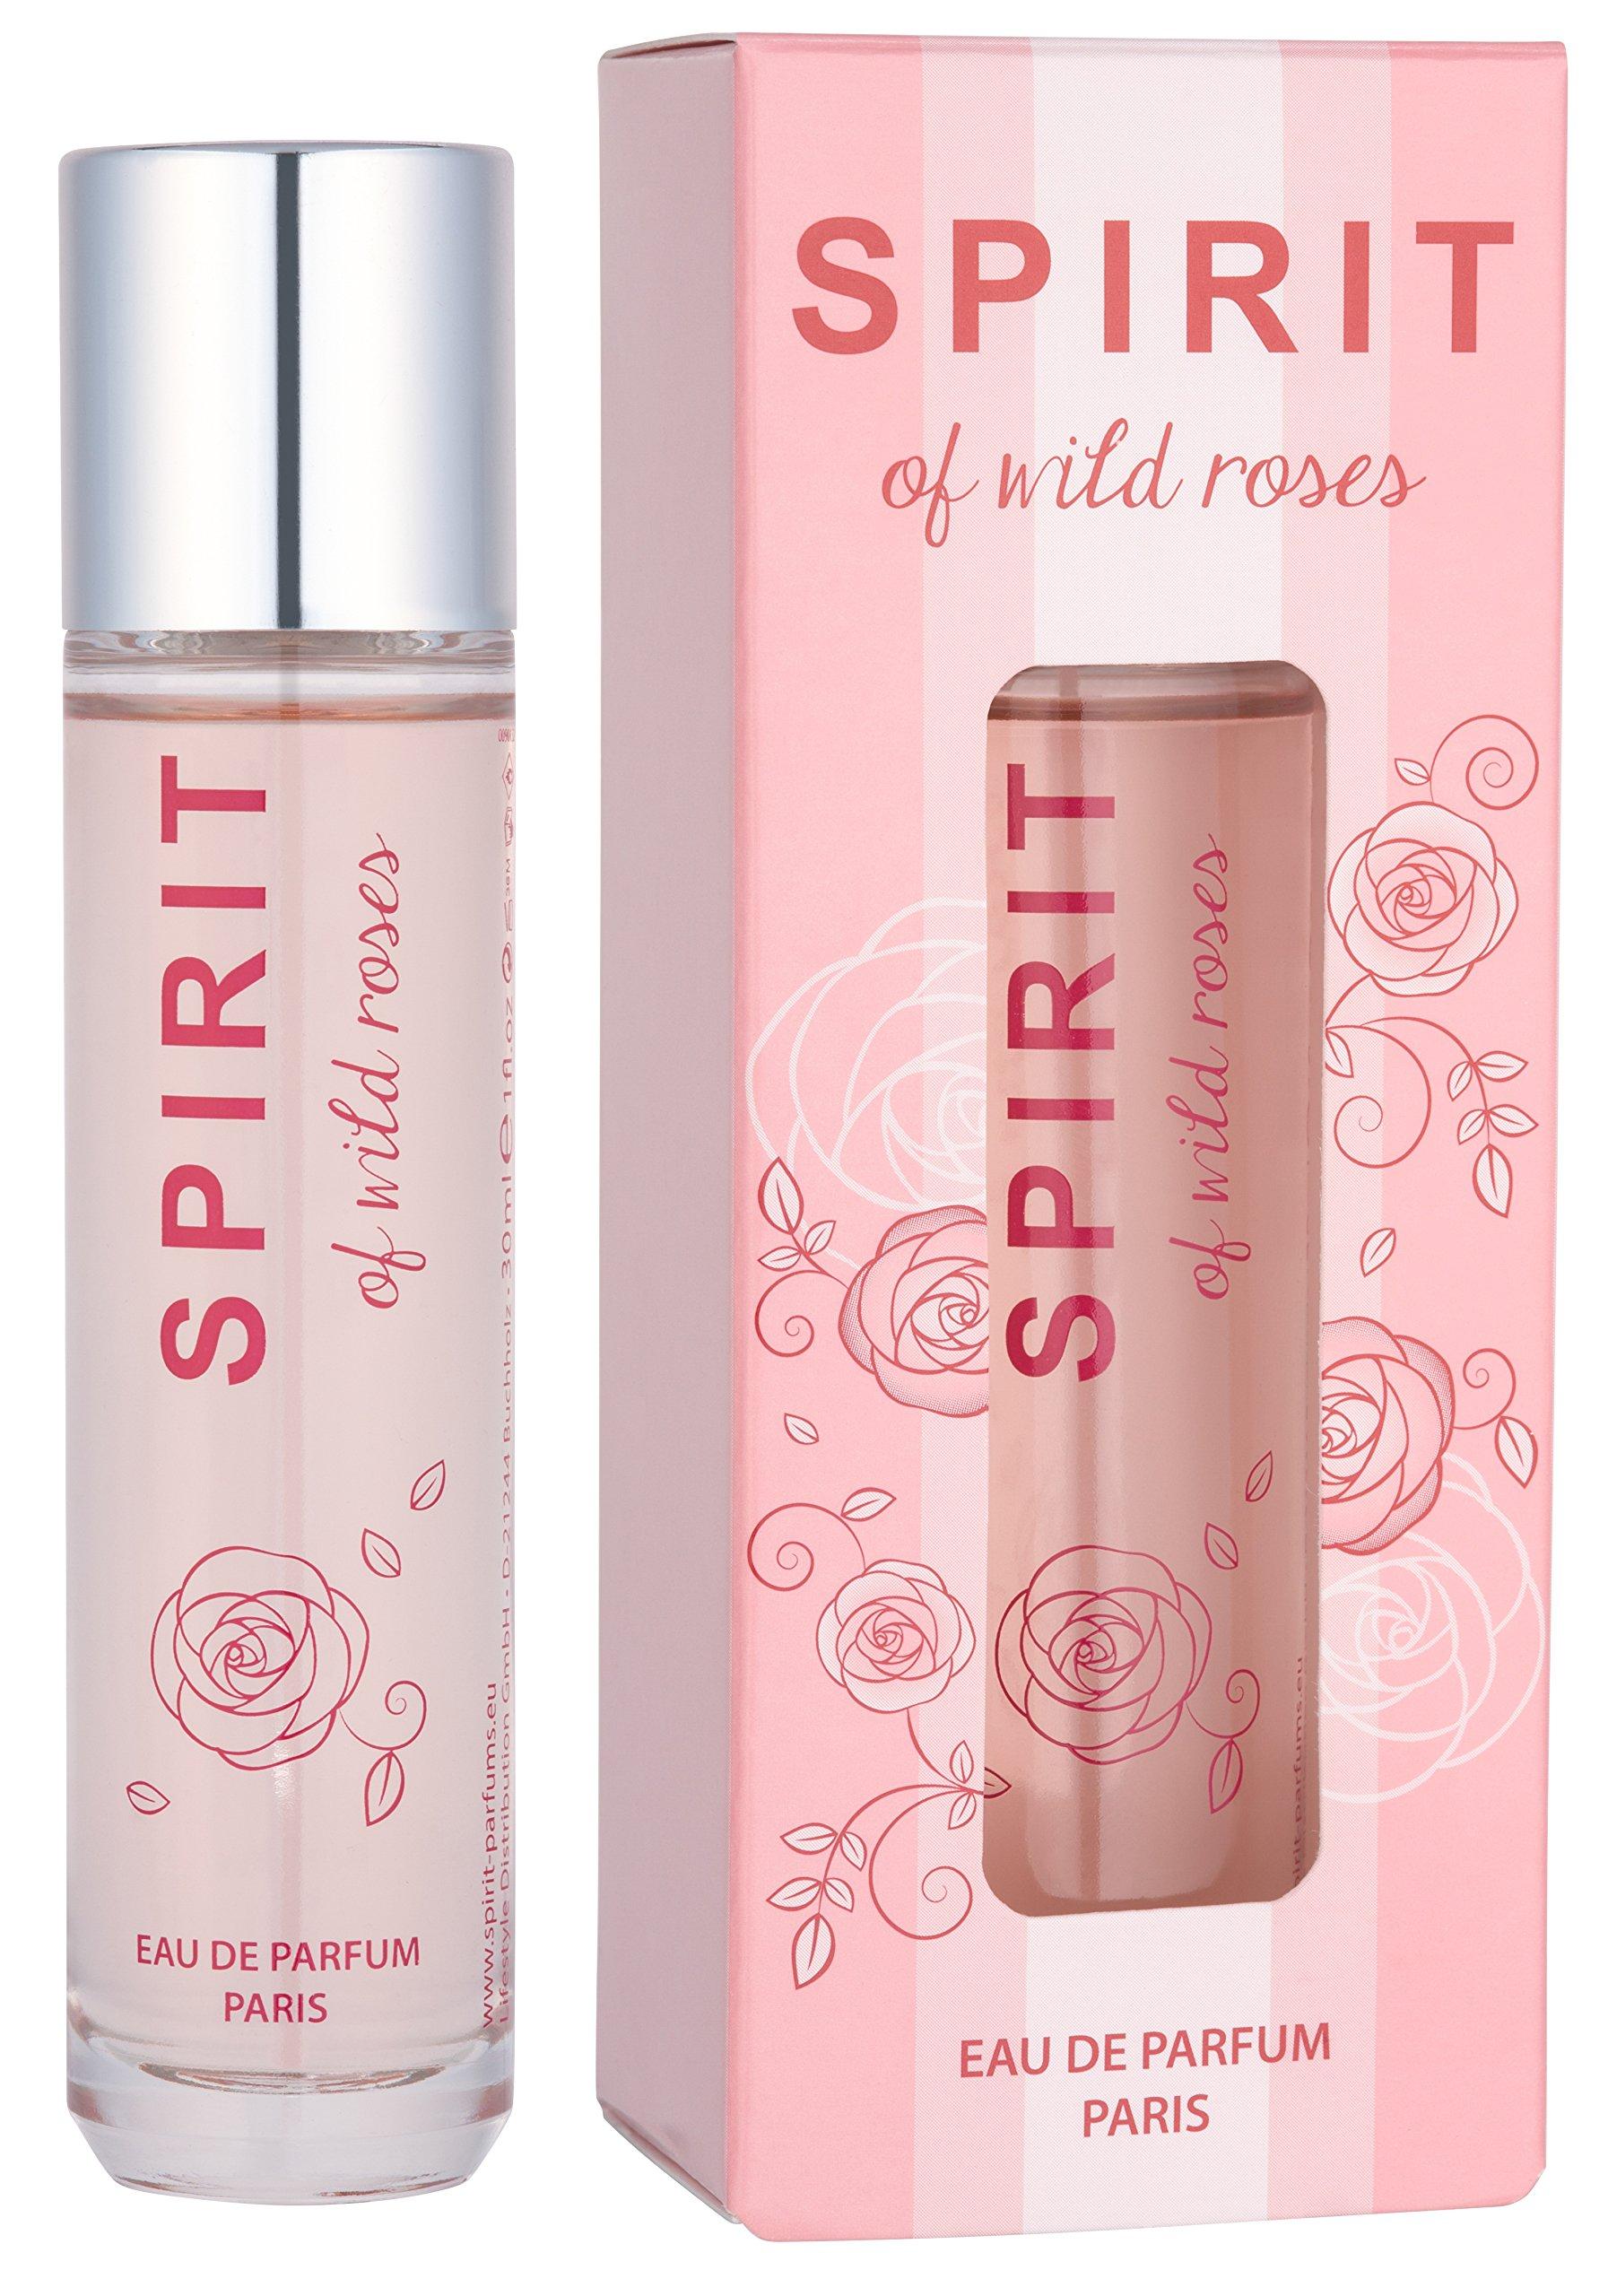 Spirit Wild Roses Eau de Parfum 30 ml